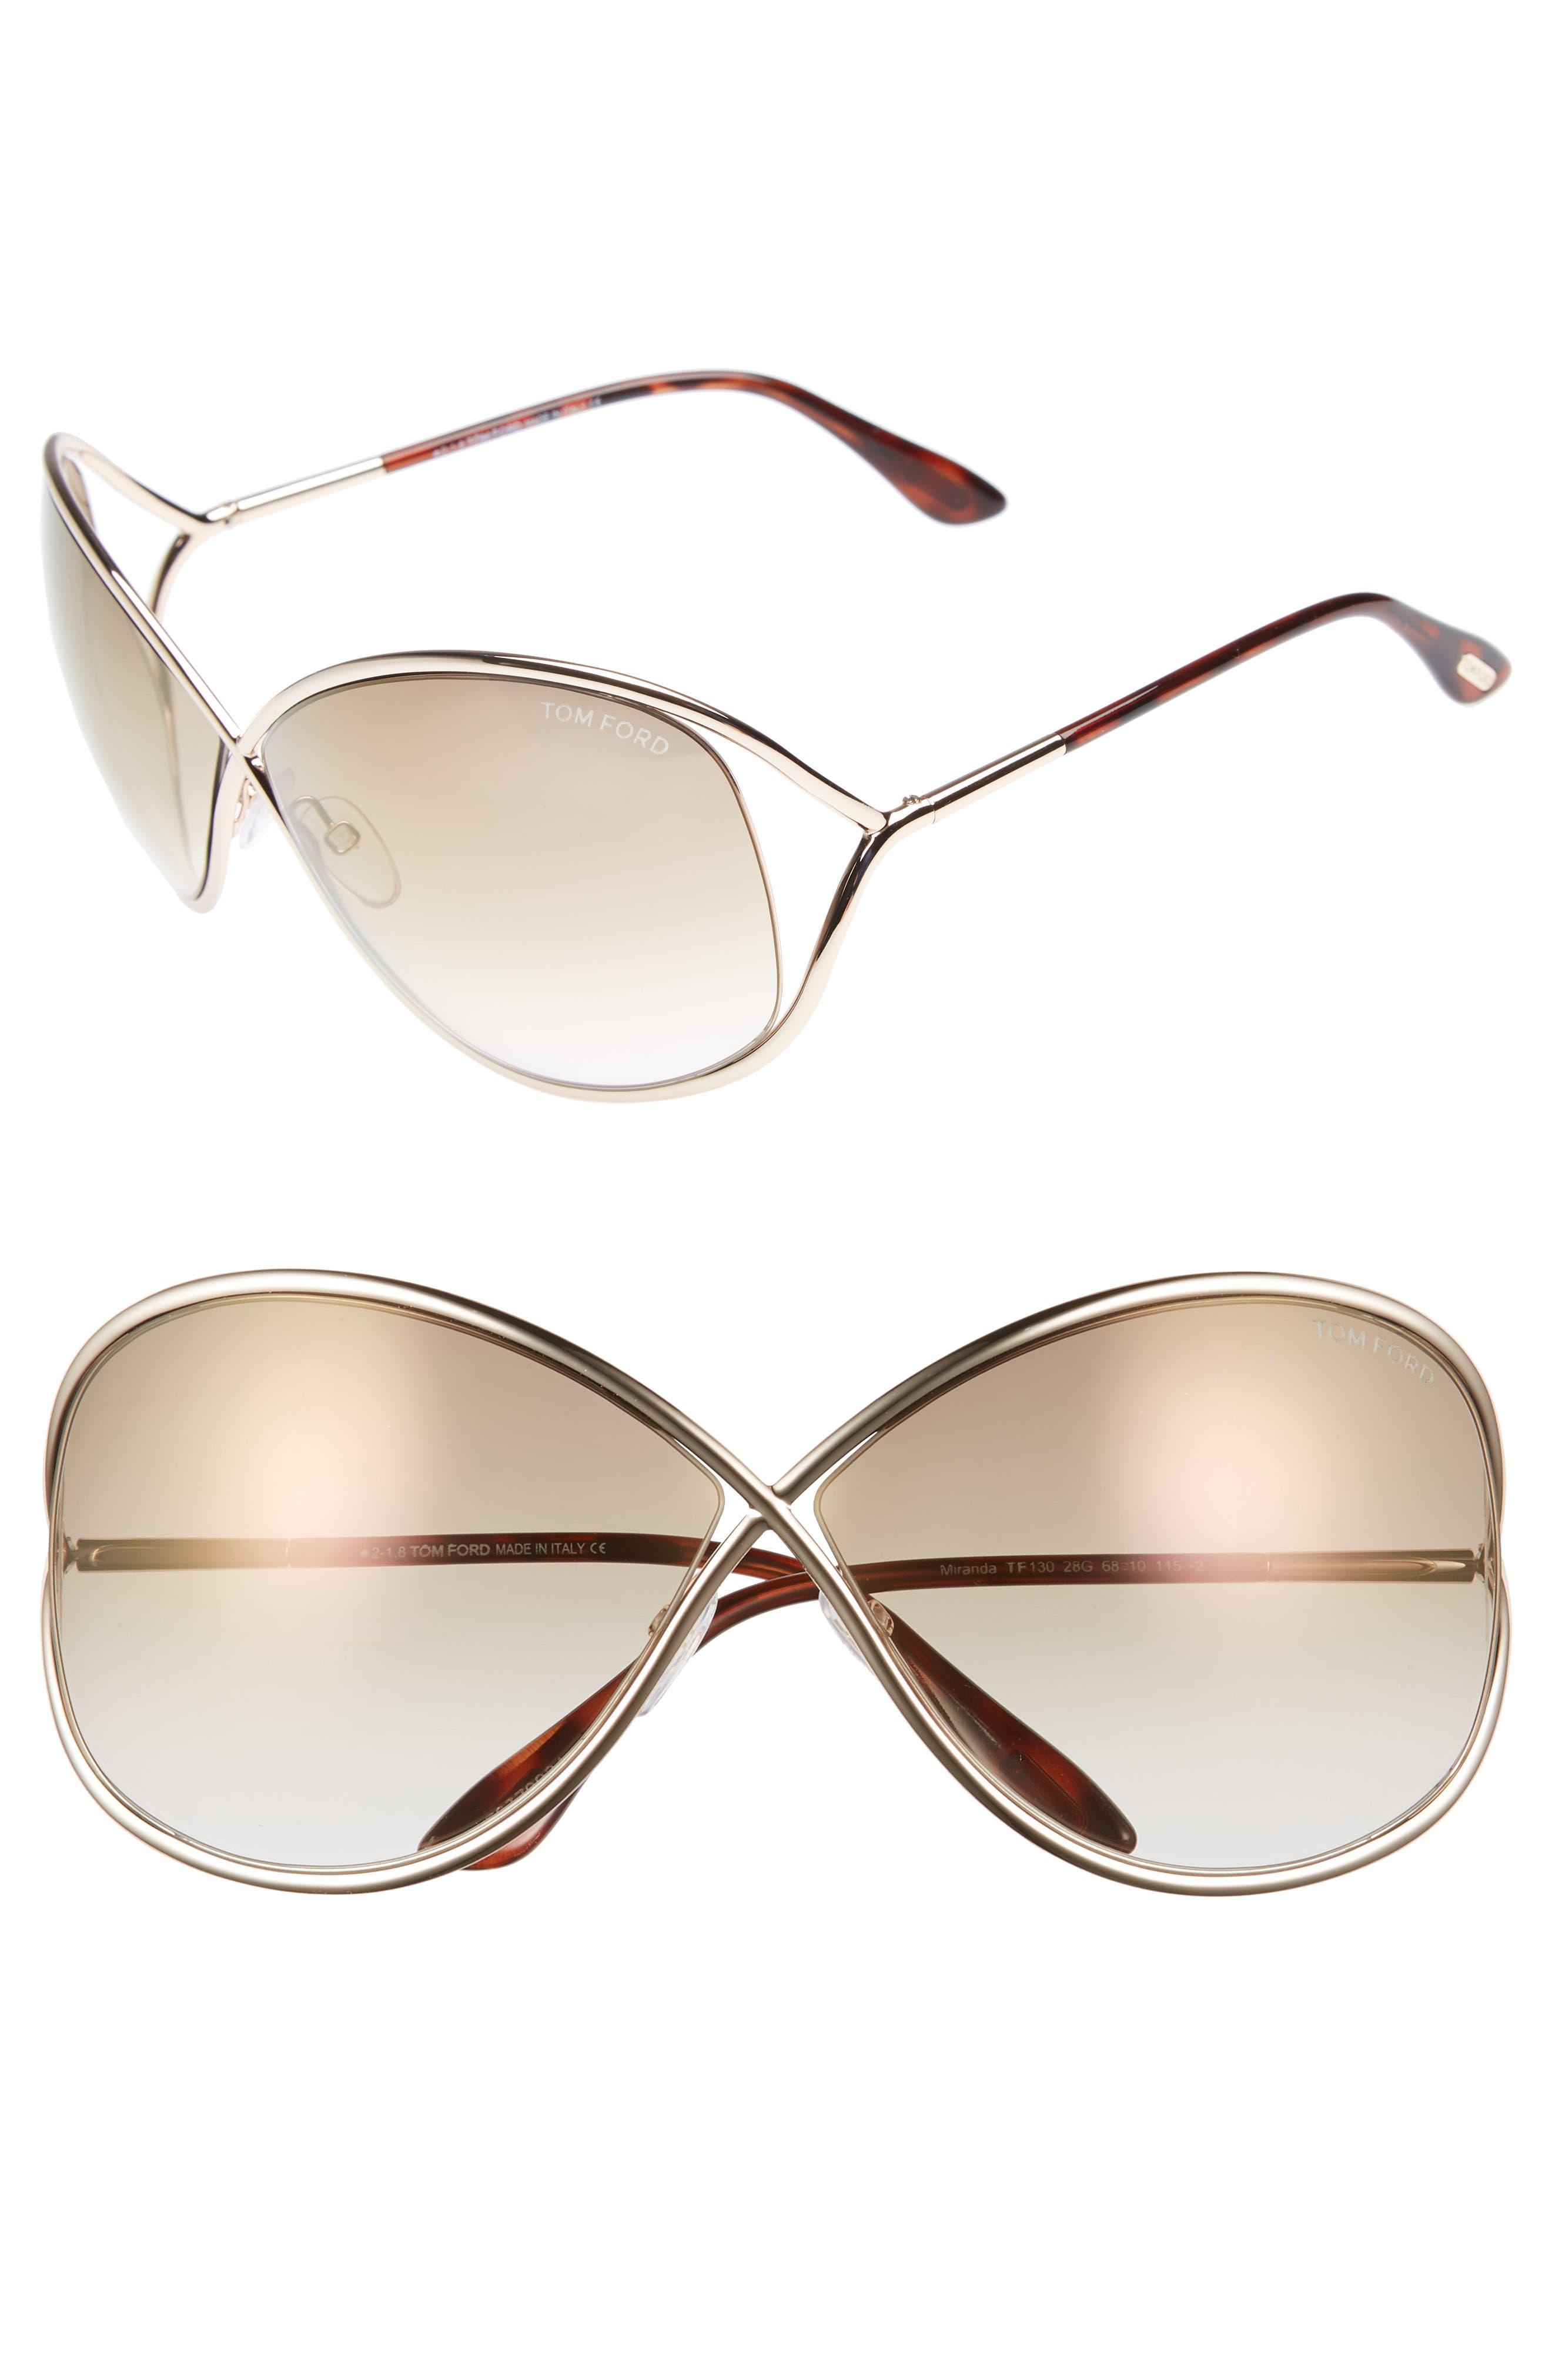 Miranda 68mm Open Temple Oversize Metal Sunglasses,                             Main thumbnail 1, color,                             Shiny Rose Gold/ Brown